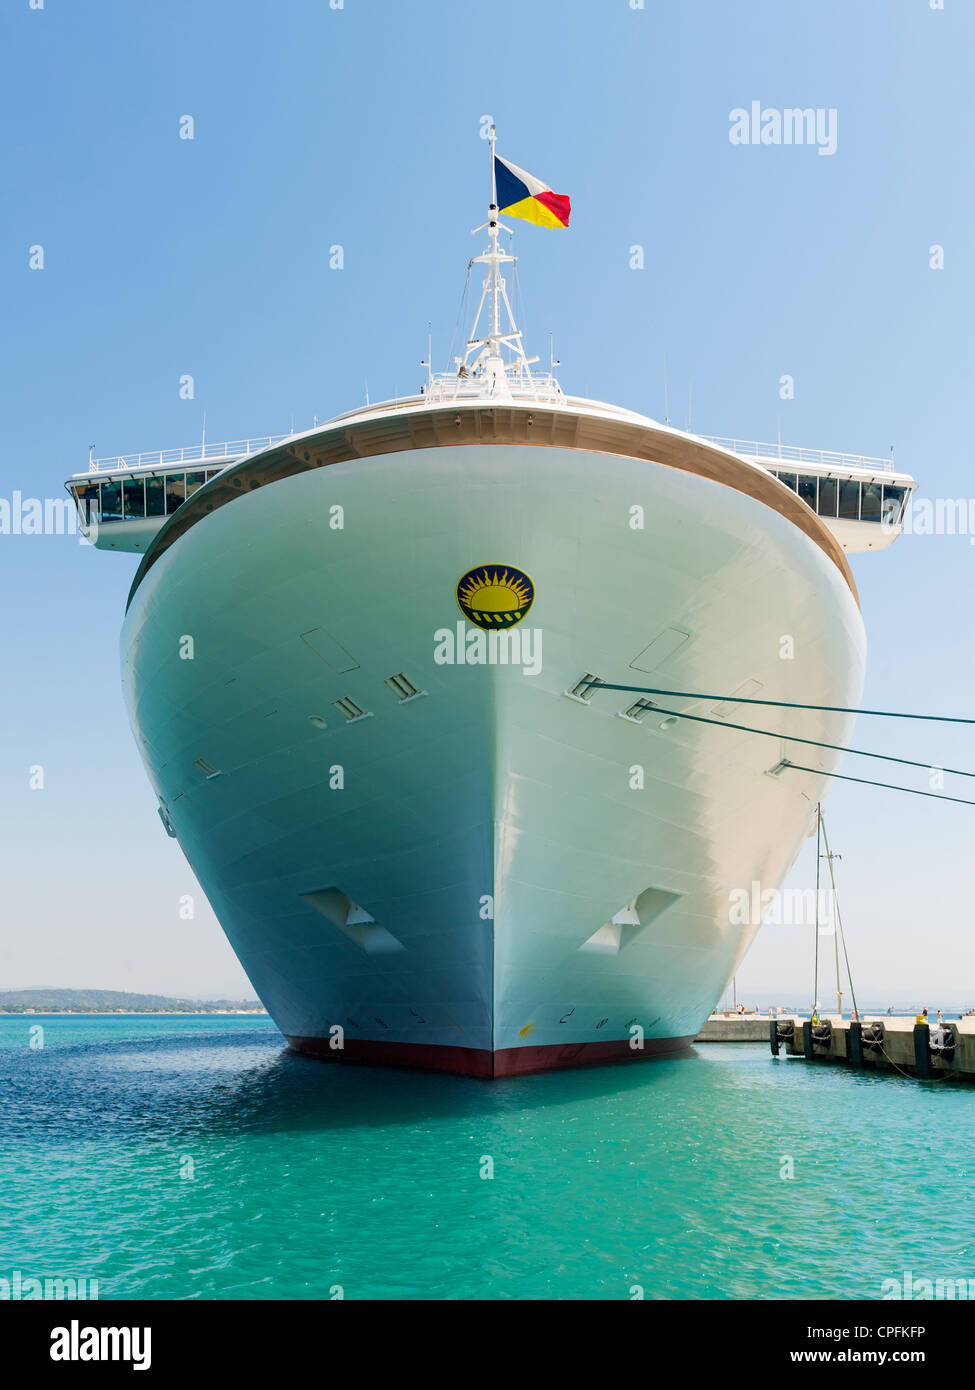 P & O Cruise ship, MS Azura (christened 2010), docked at Katakolon, Greece. - Stock Image